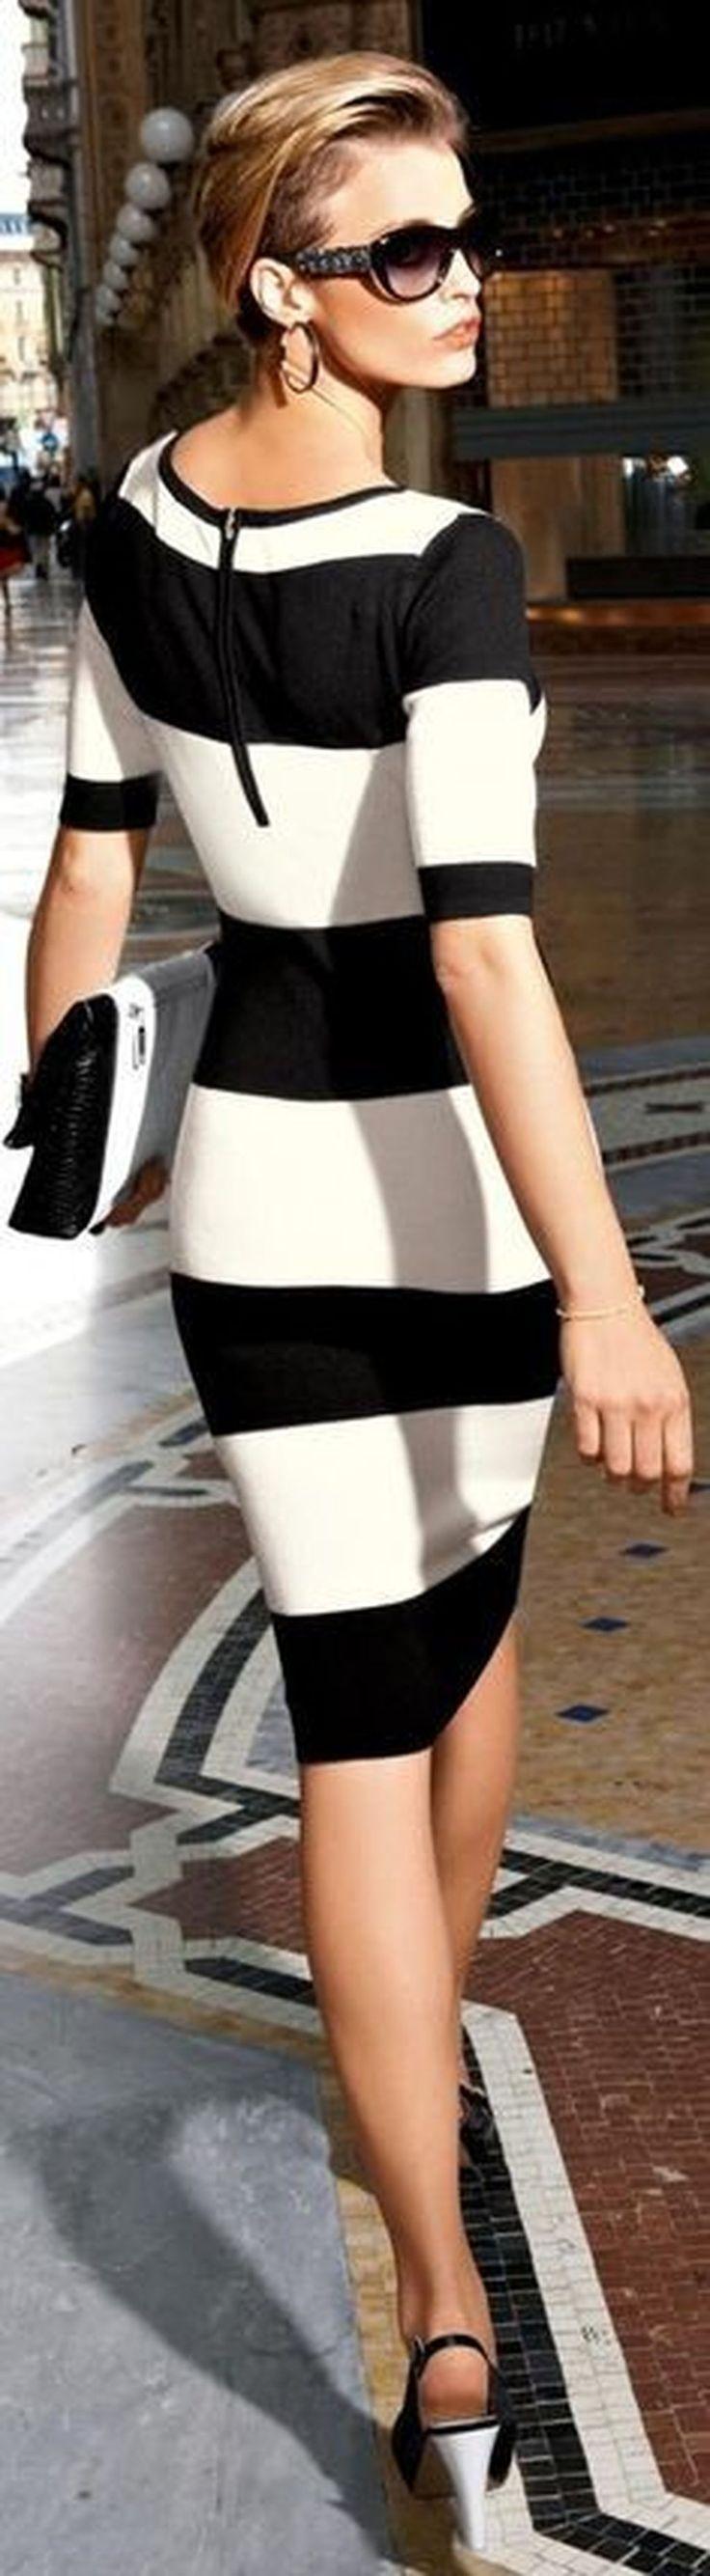 cool 59 Cute Black And White Striped Dresses Ideas  http://lovellywedding.com/2018/02/20/59-cute-black-white-striped-dresses-ideas/